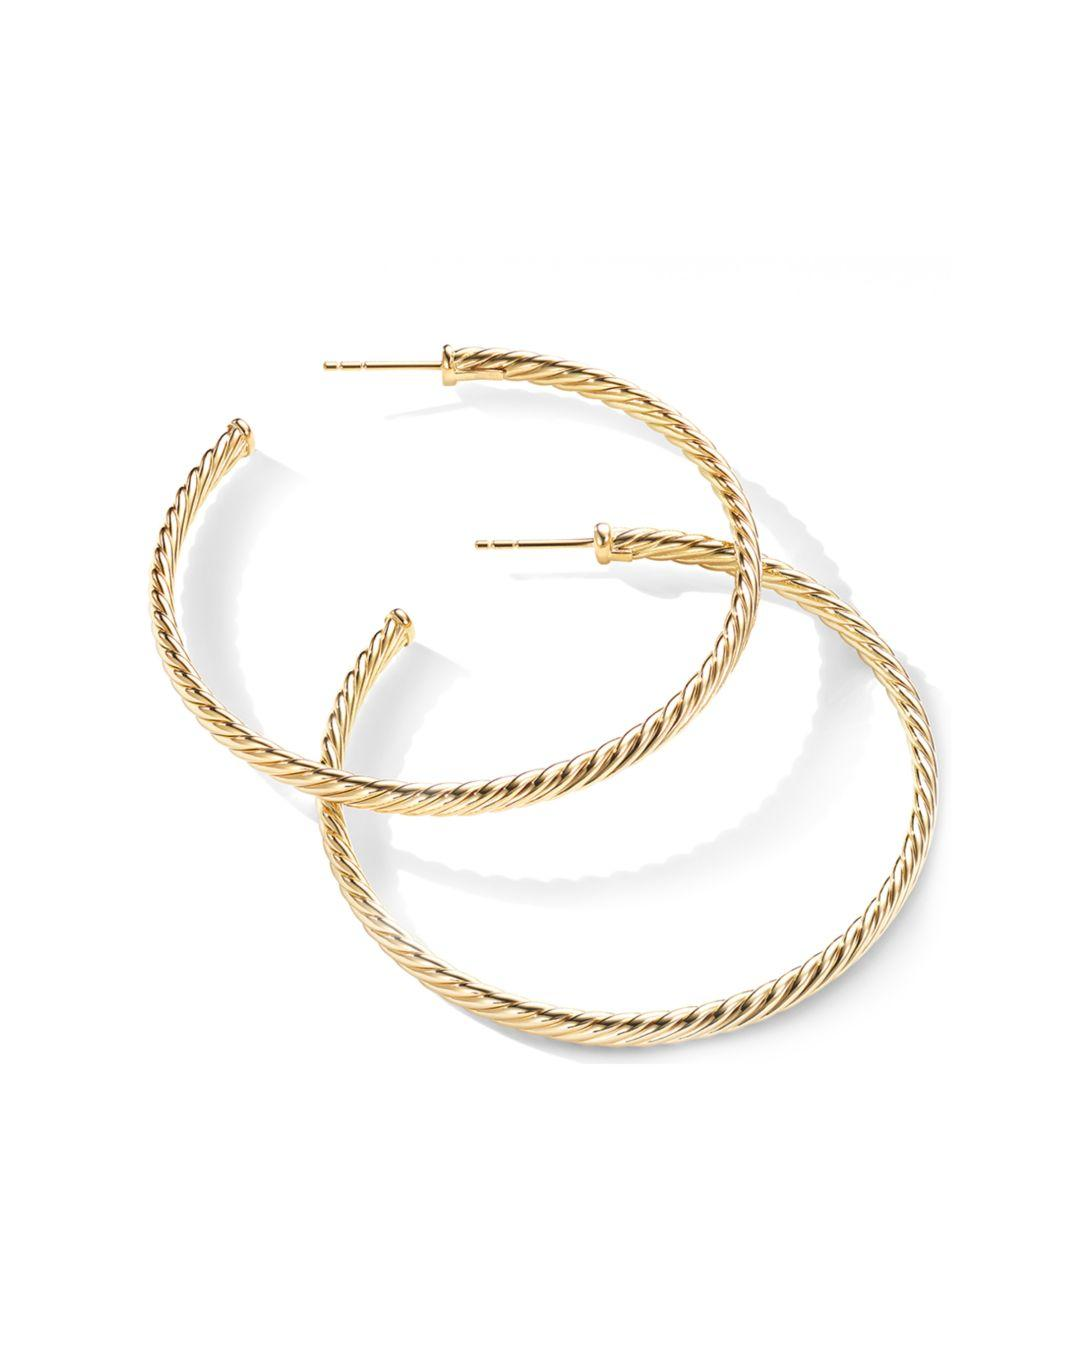 fbf966d52395 Lyst - David Yurman 18k Yellow Gold Cable Spiral Hoop Earrings in Metallic